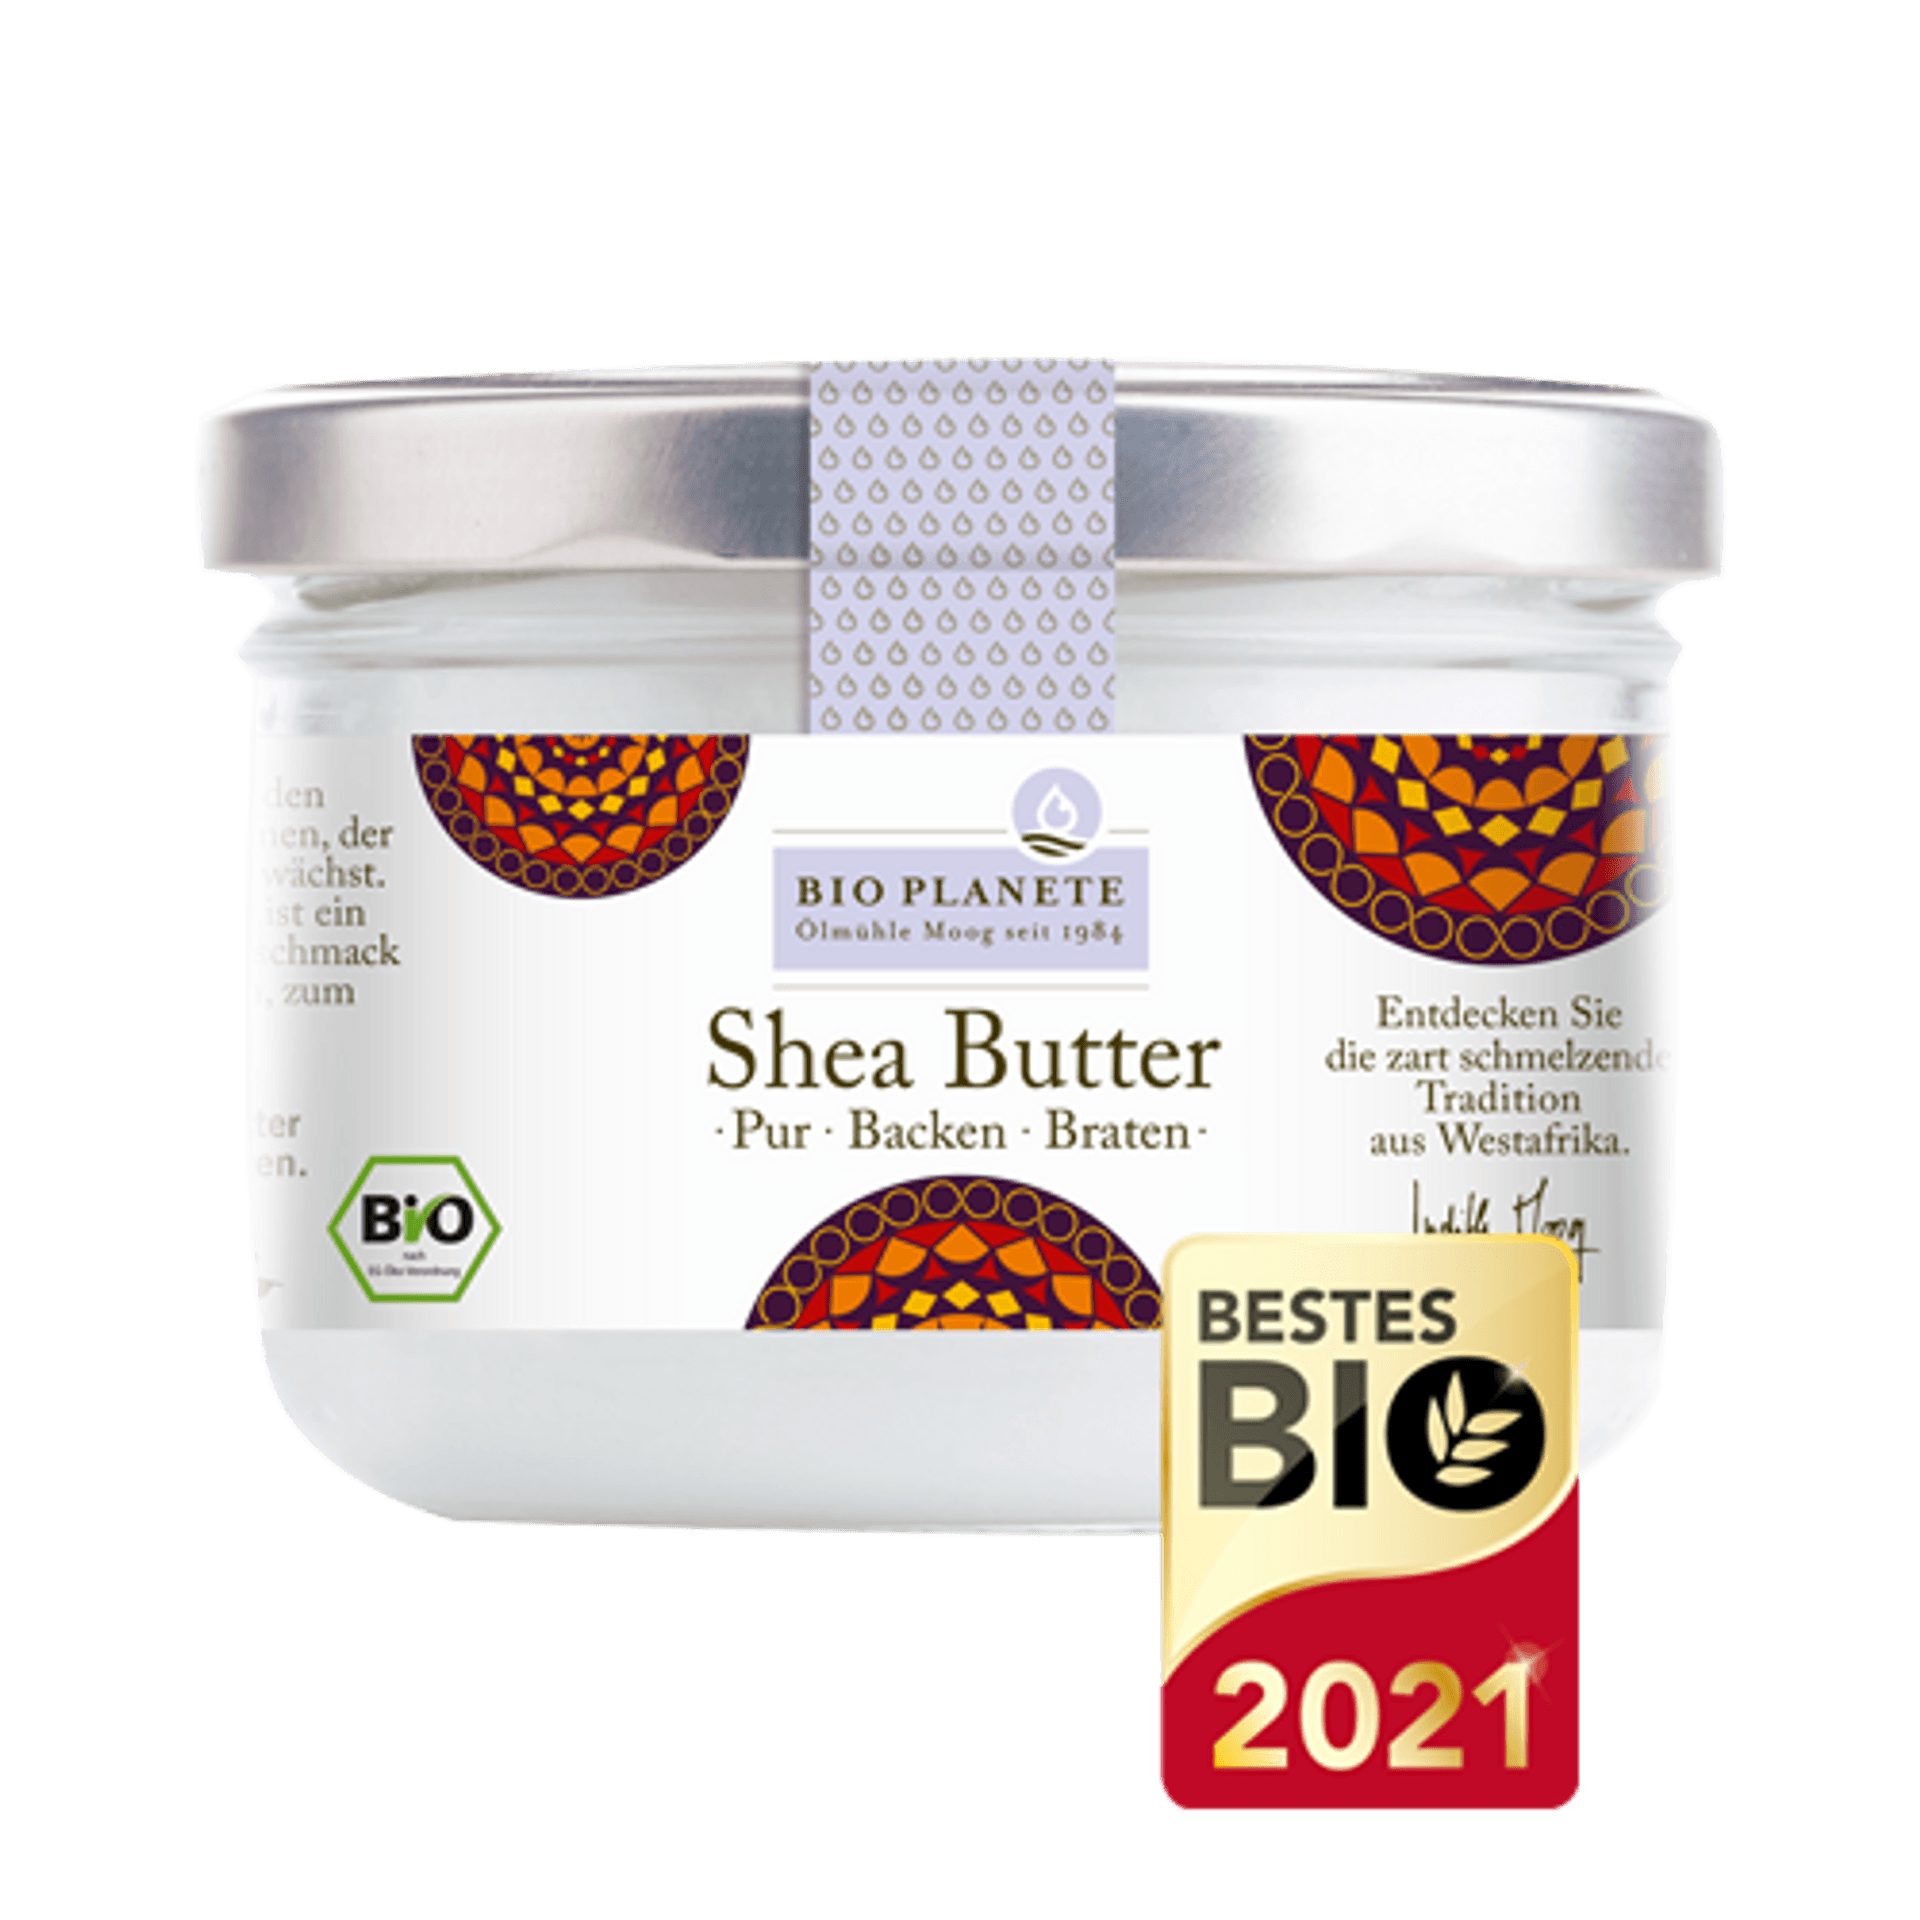 Glastiegel mit Shea-Butter